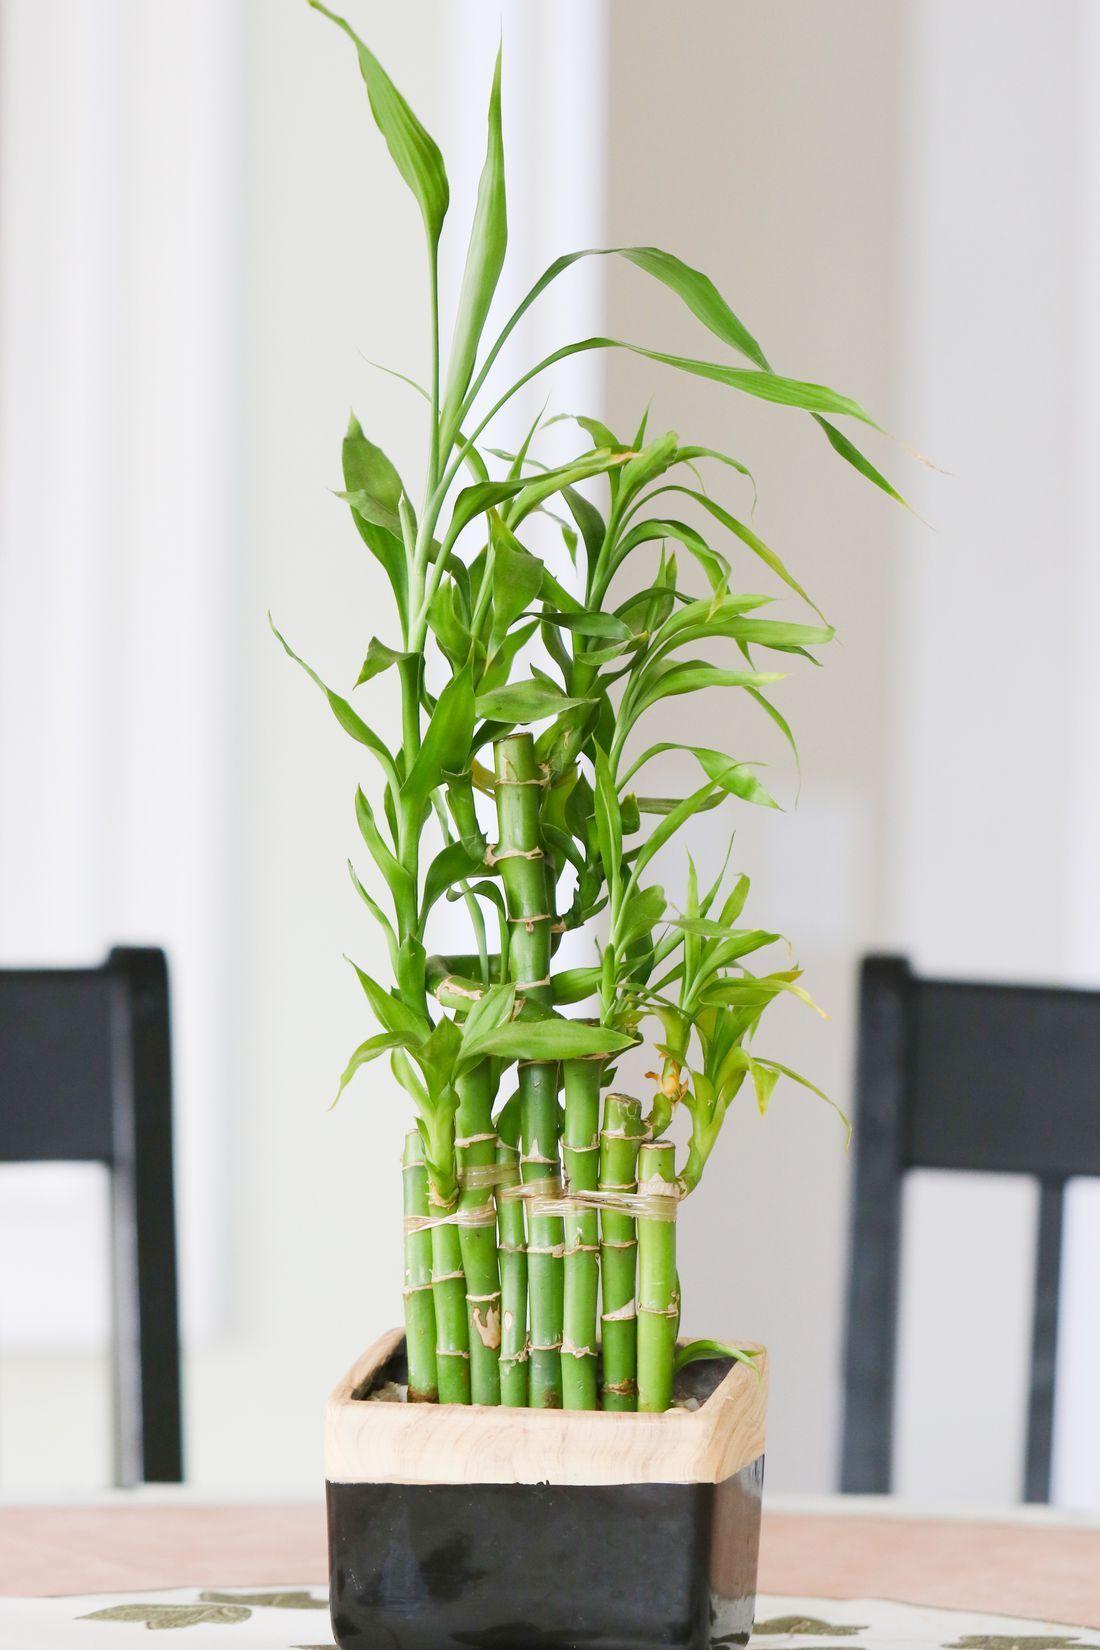 Bamboo plant indoor Indoor bamboo plant, Bamboo plant